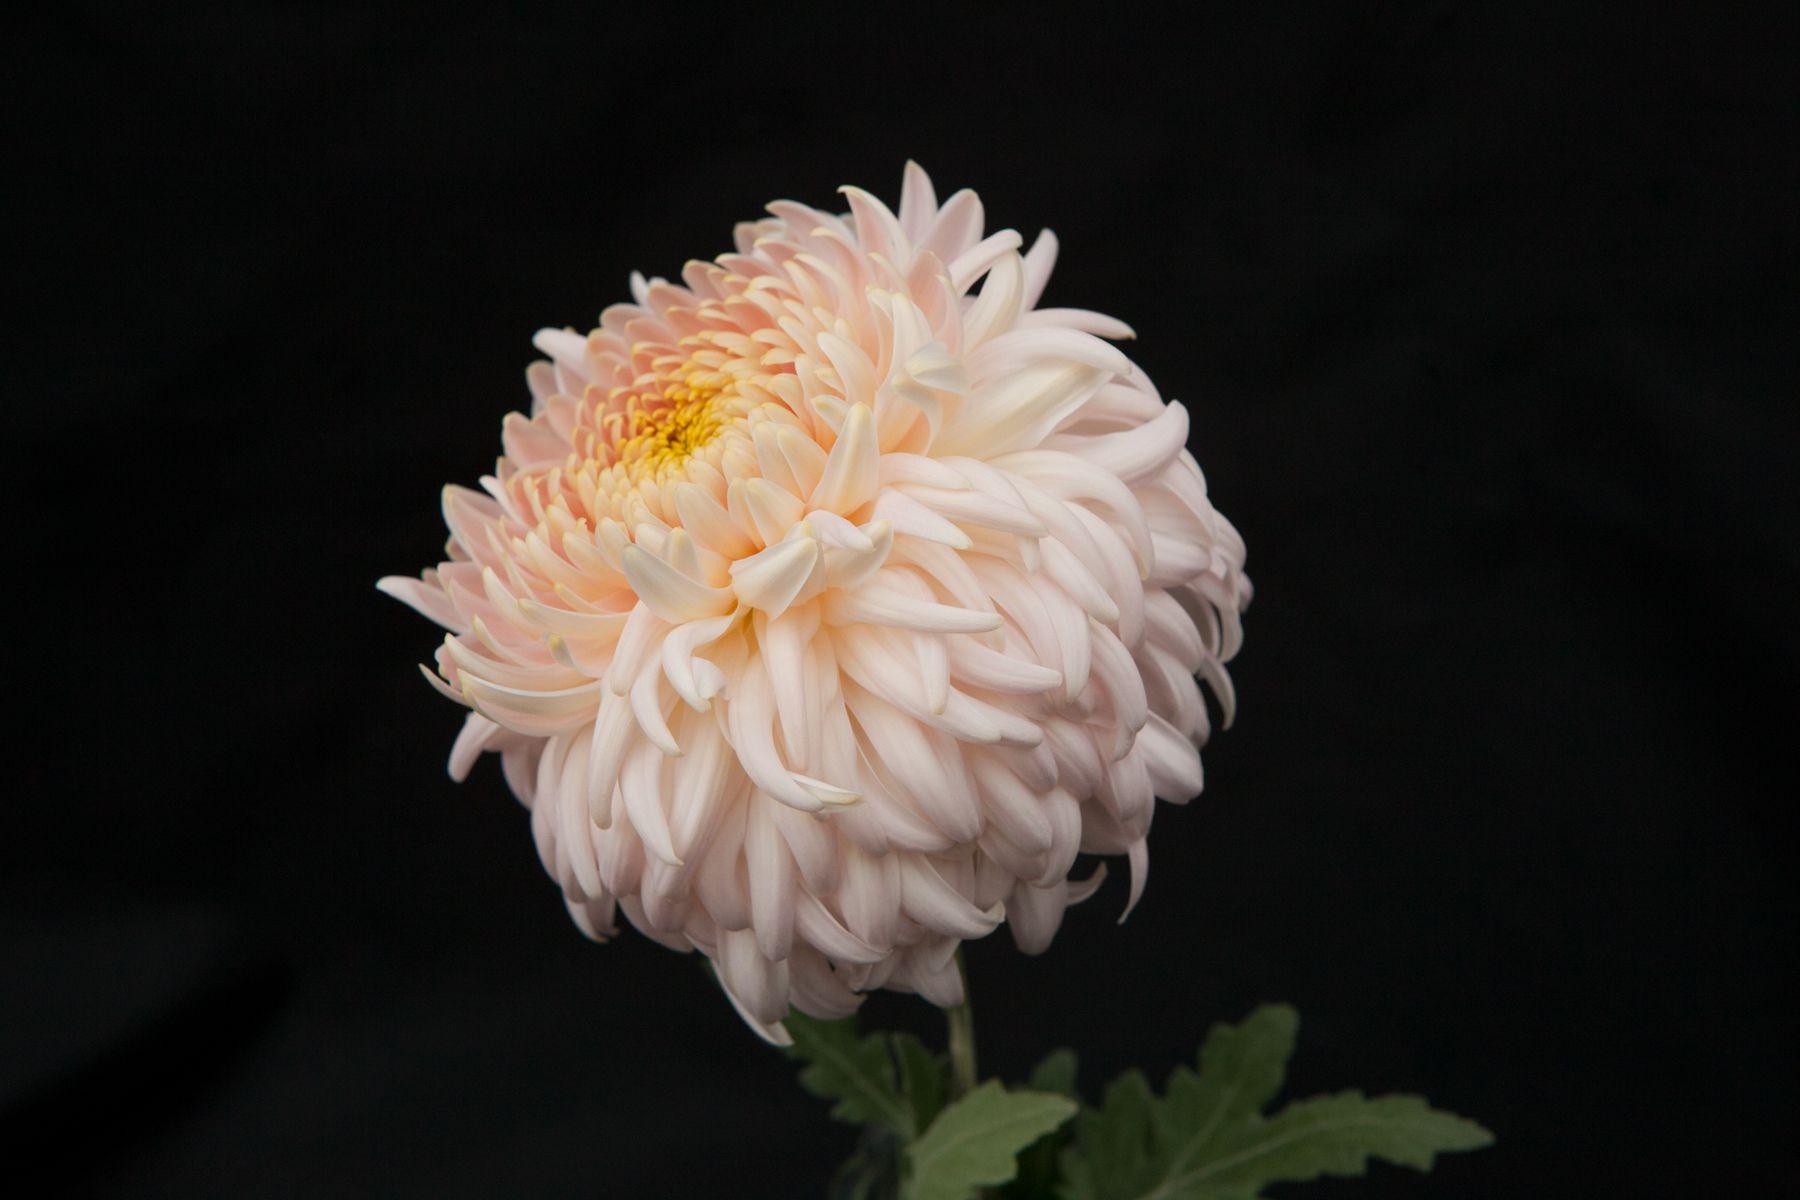 A Perfect Blush Toned Chrysanthemum Similar To The Cafe Au Lait Dahlia Flower Farmer Flowers Flower Farm